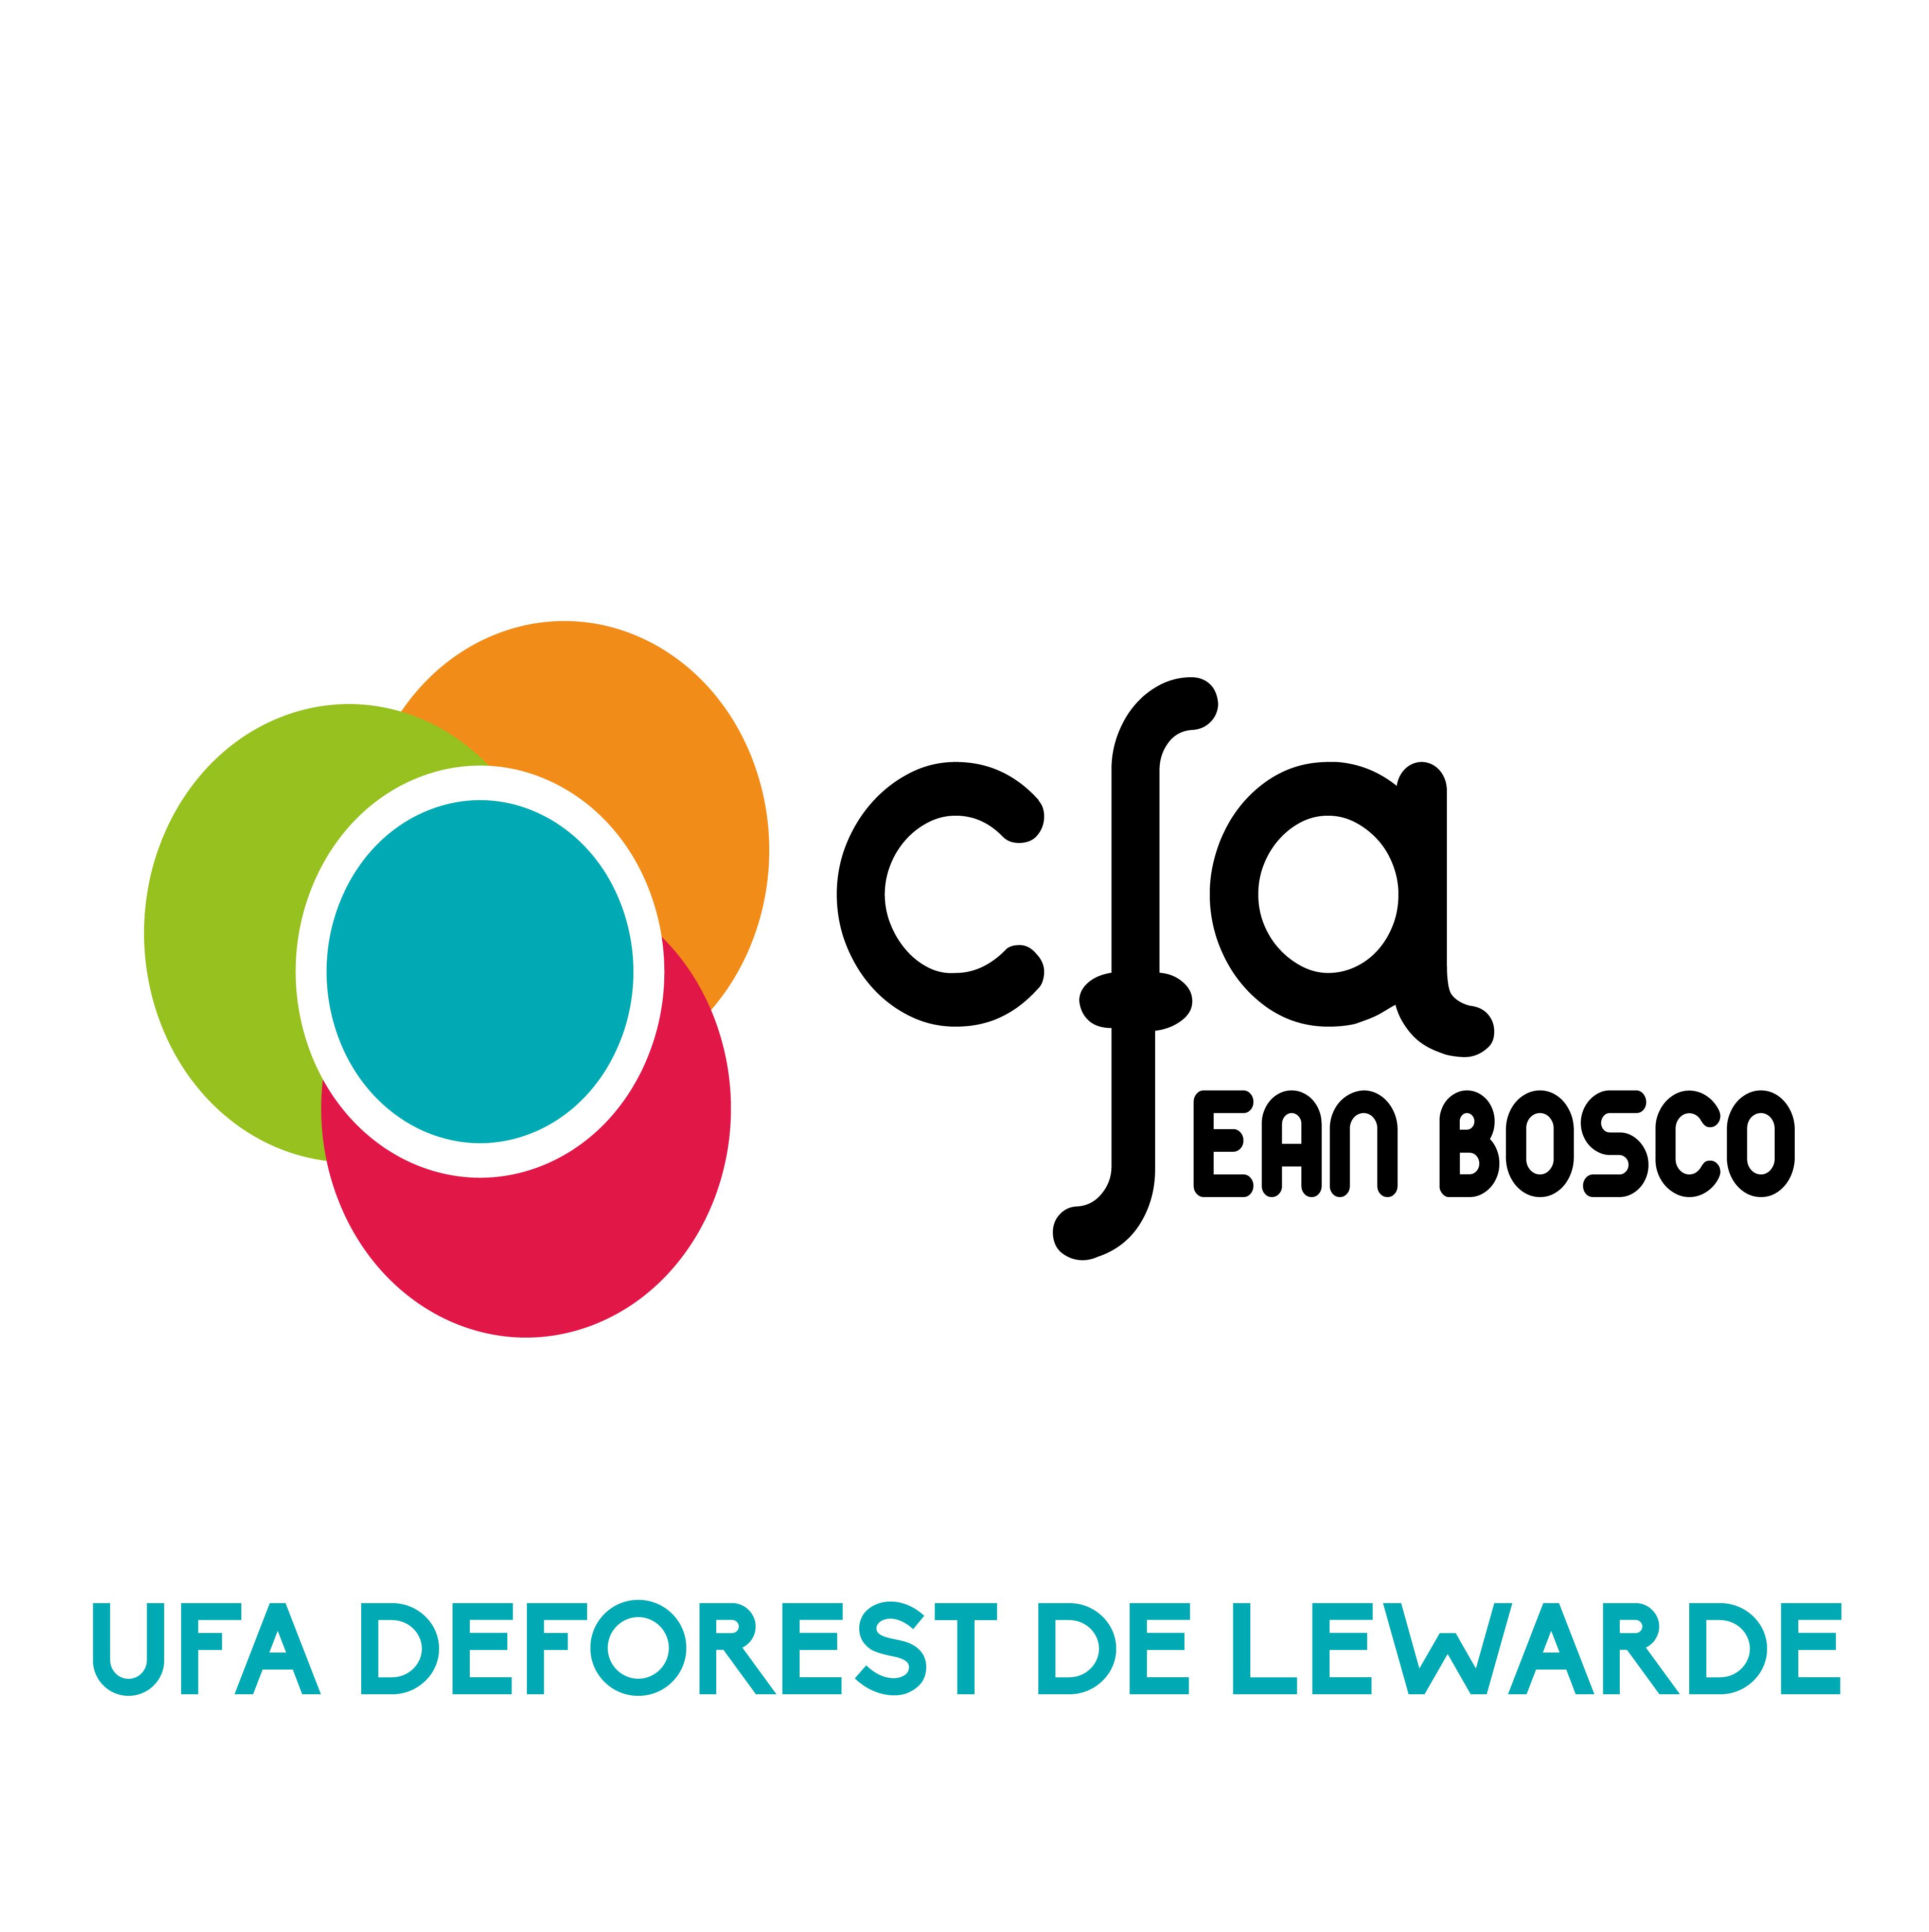 LOGO CFA-DEFOREST-DELEWARDE-33